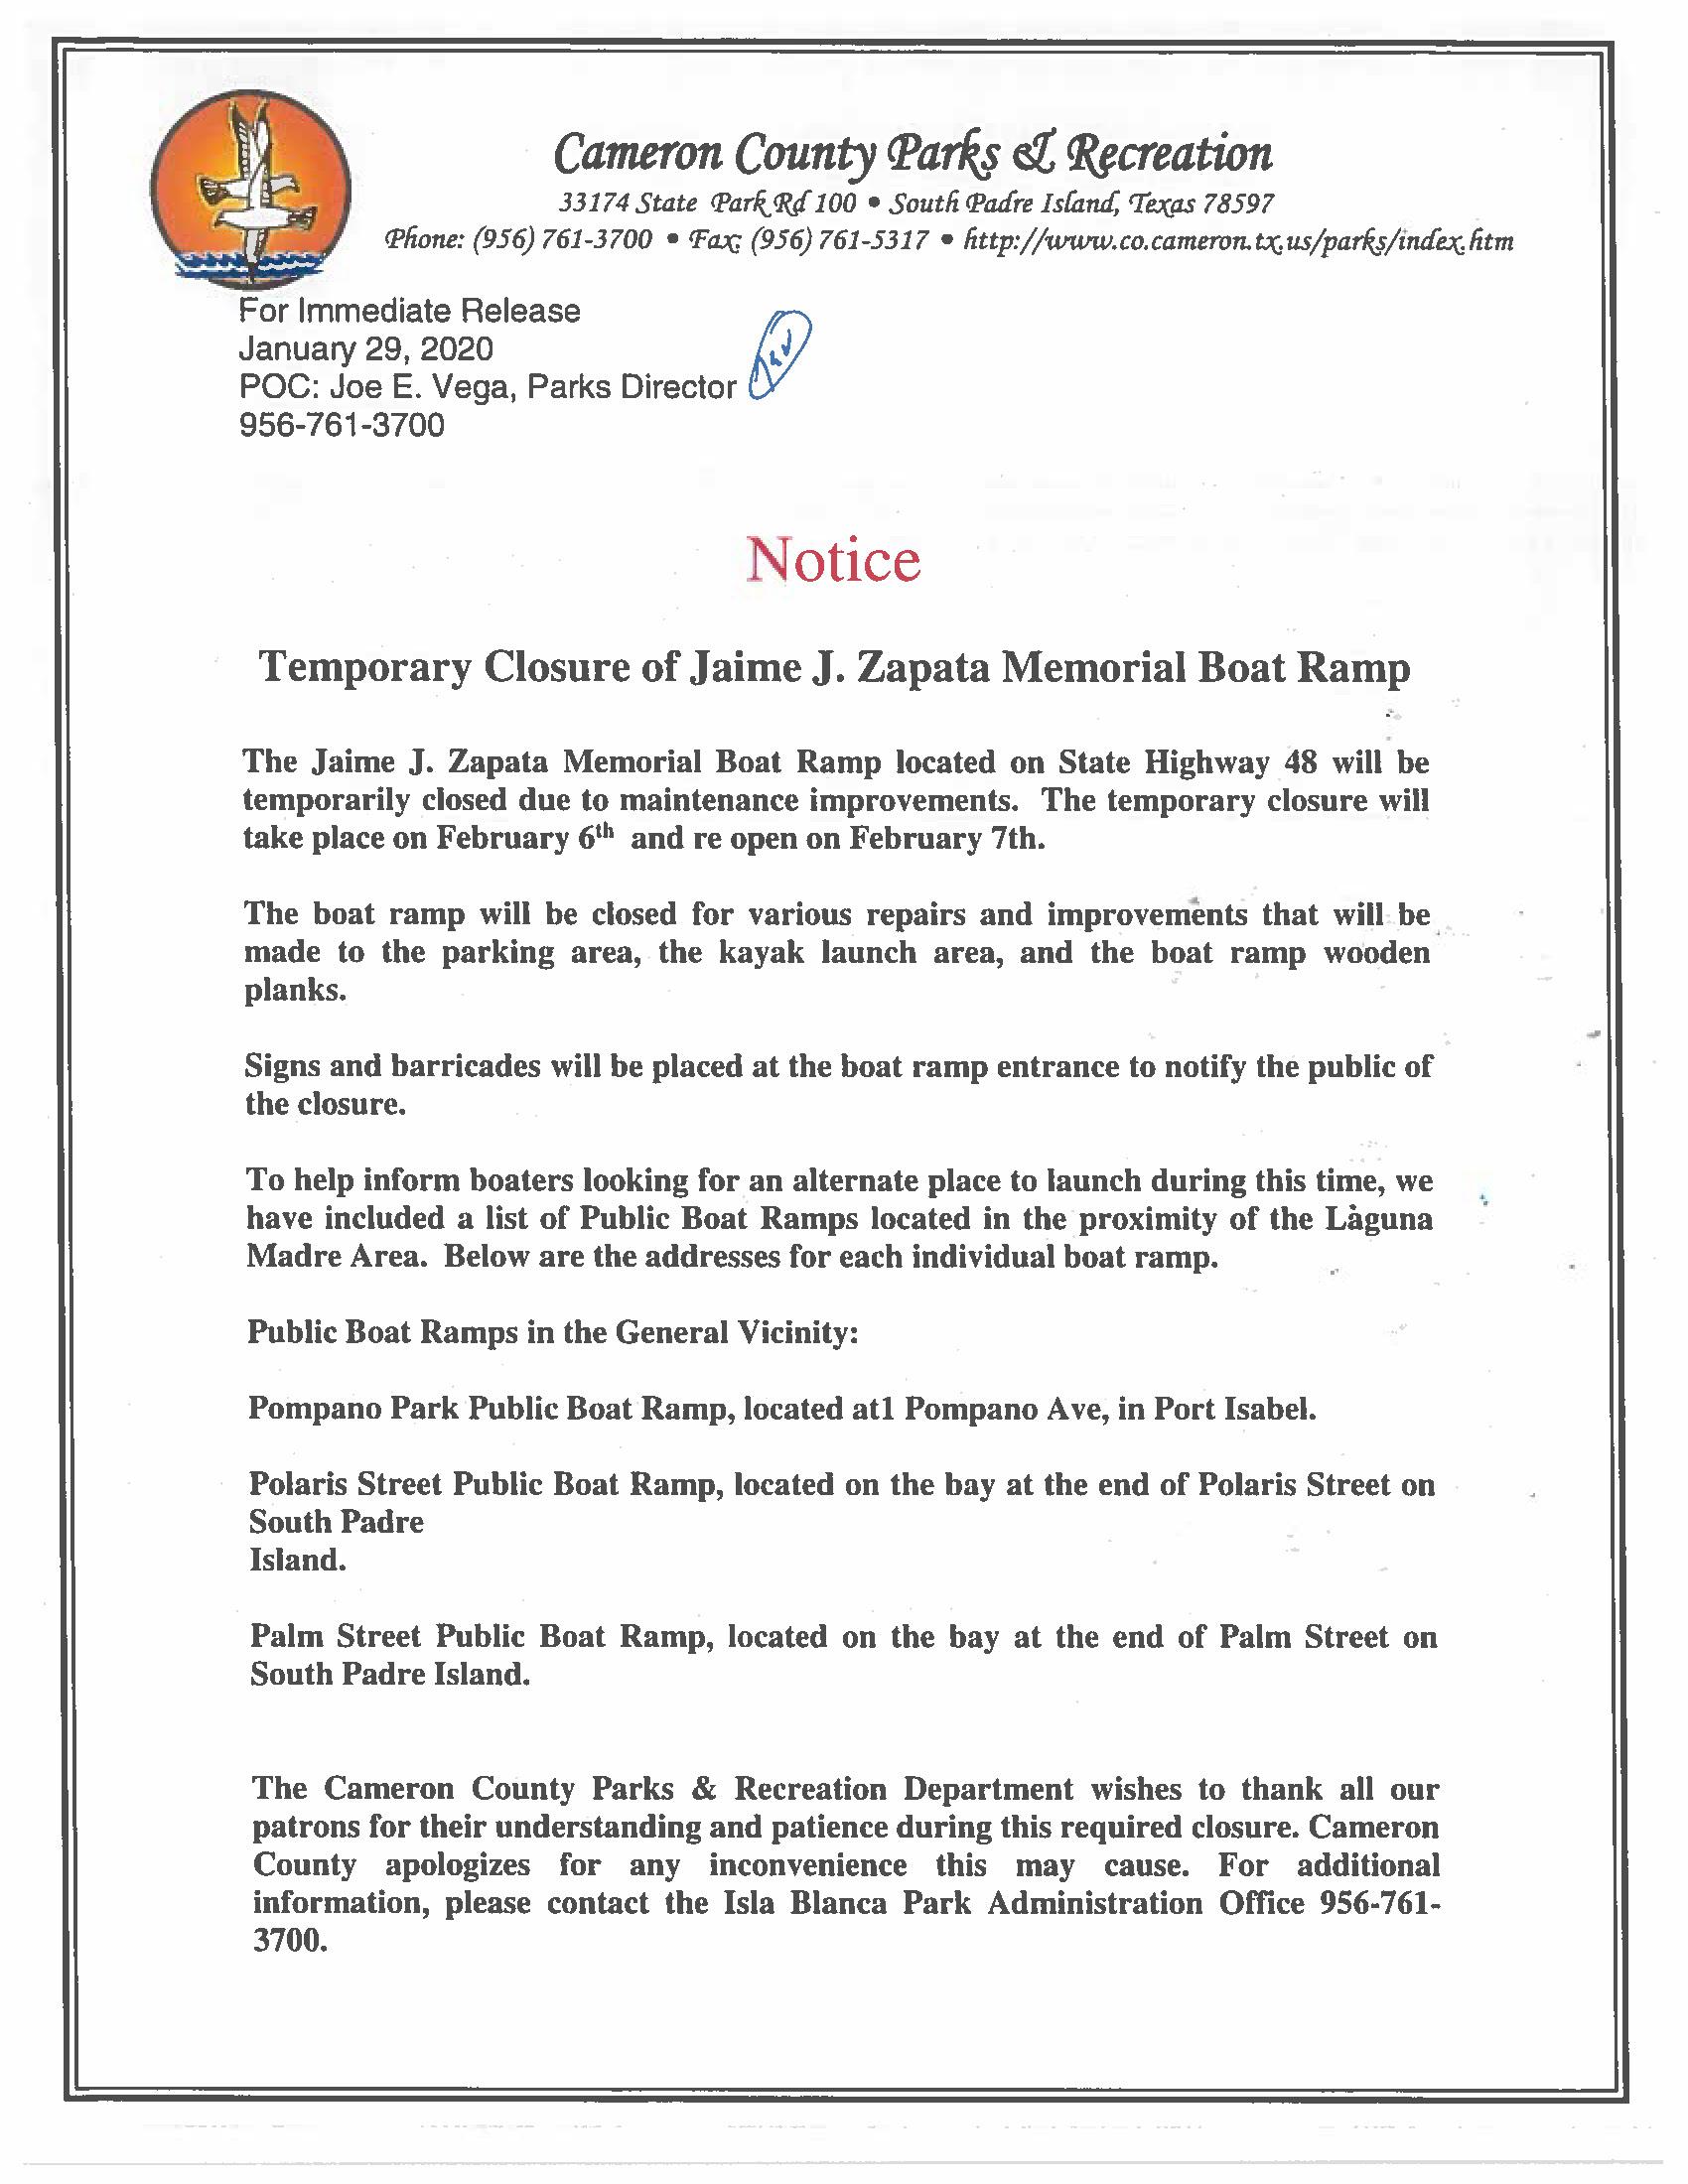 Notice Of Temporary Closure Of Jaime J Zapata Memorial Boat Ramp Press Release 1 29 20